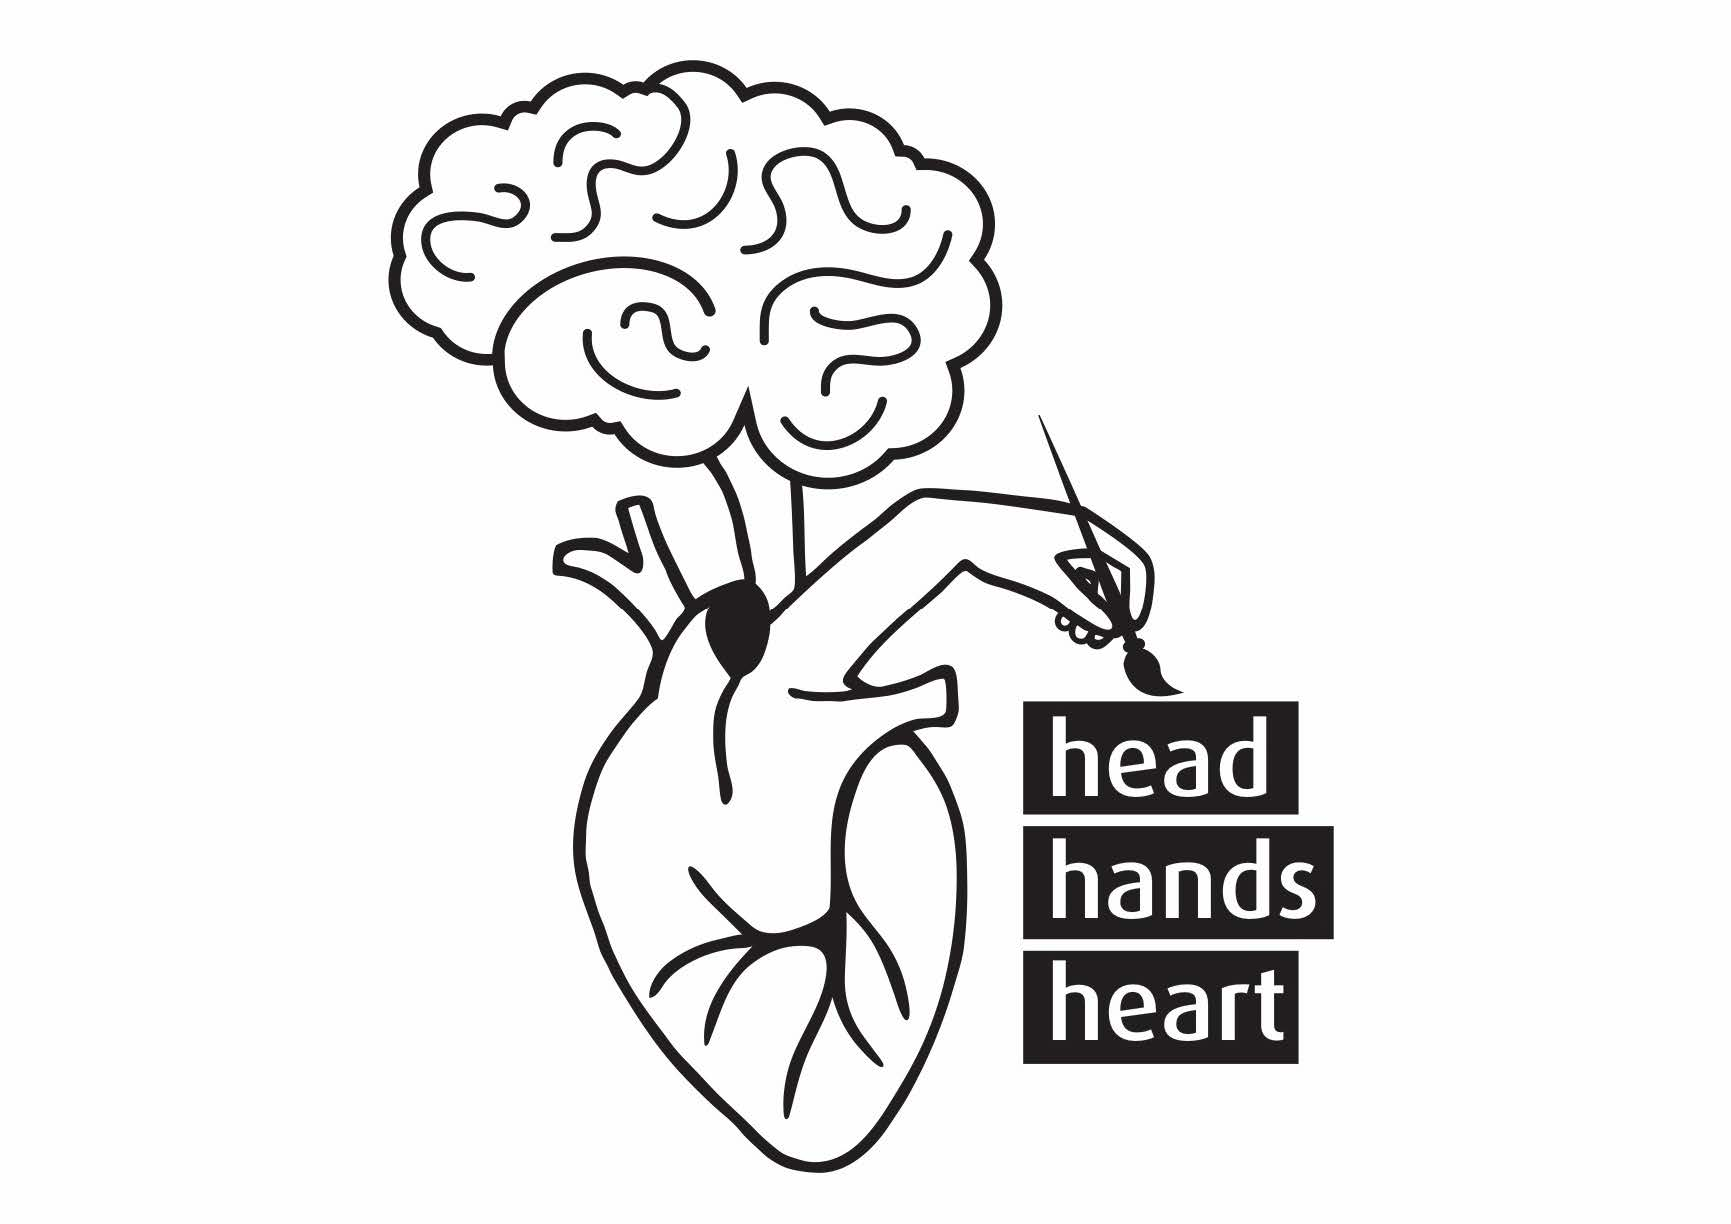 Head, hands & heart © HKB 2017